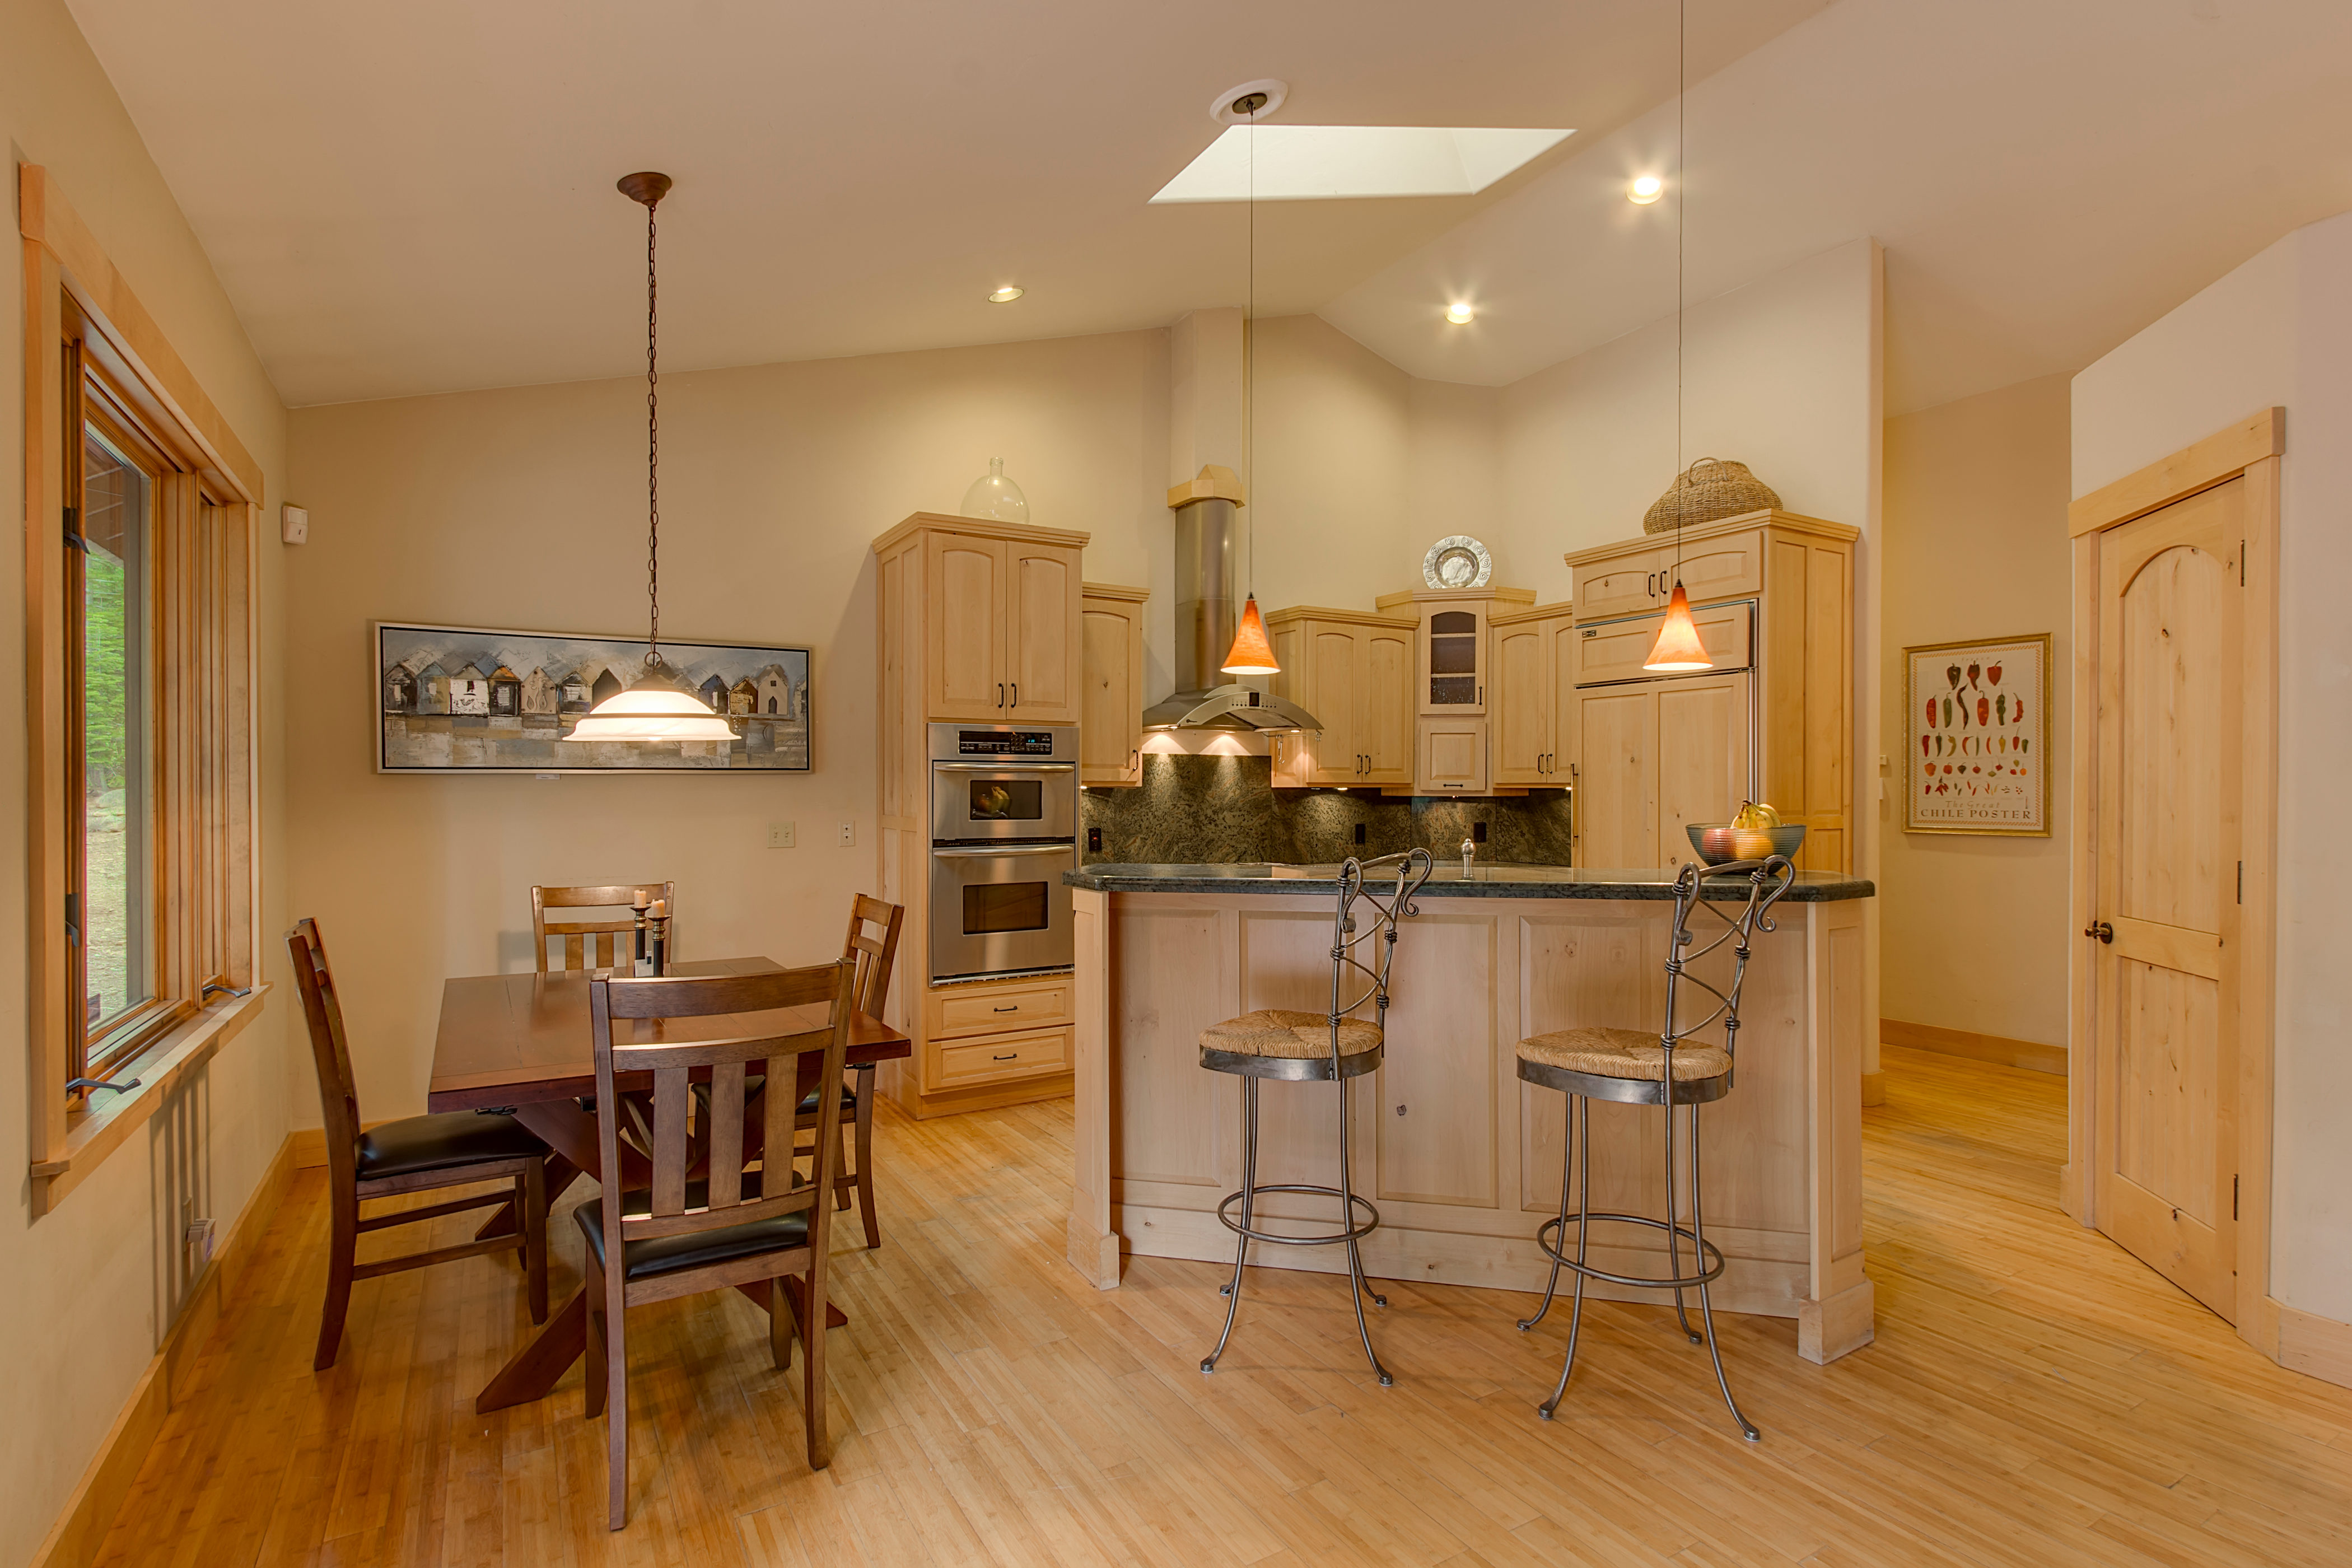 wwwbeaconlodgeinfo-print-006-13-KitchenBreakfast Bar-4200x2800-300dpi